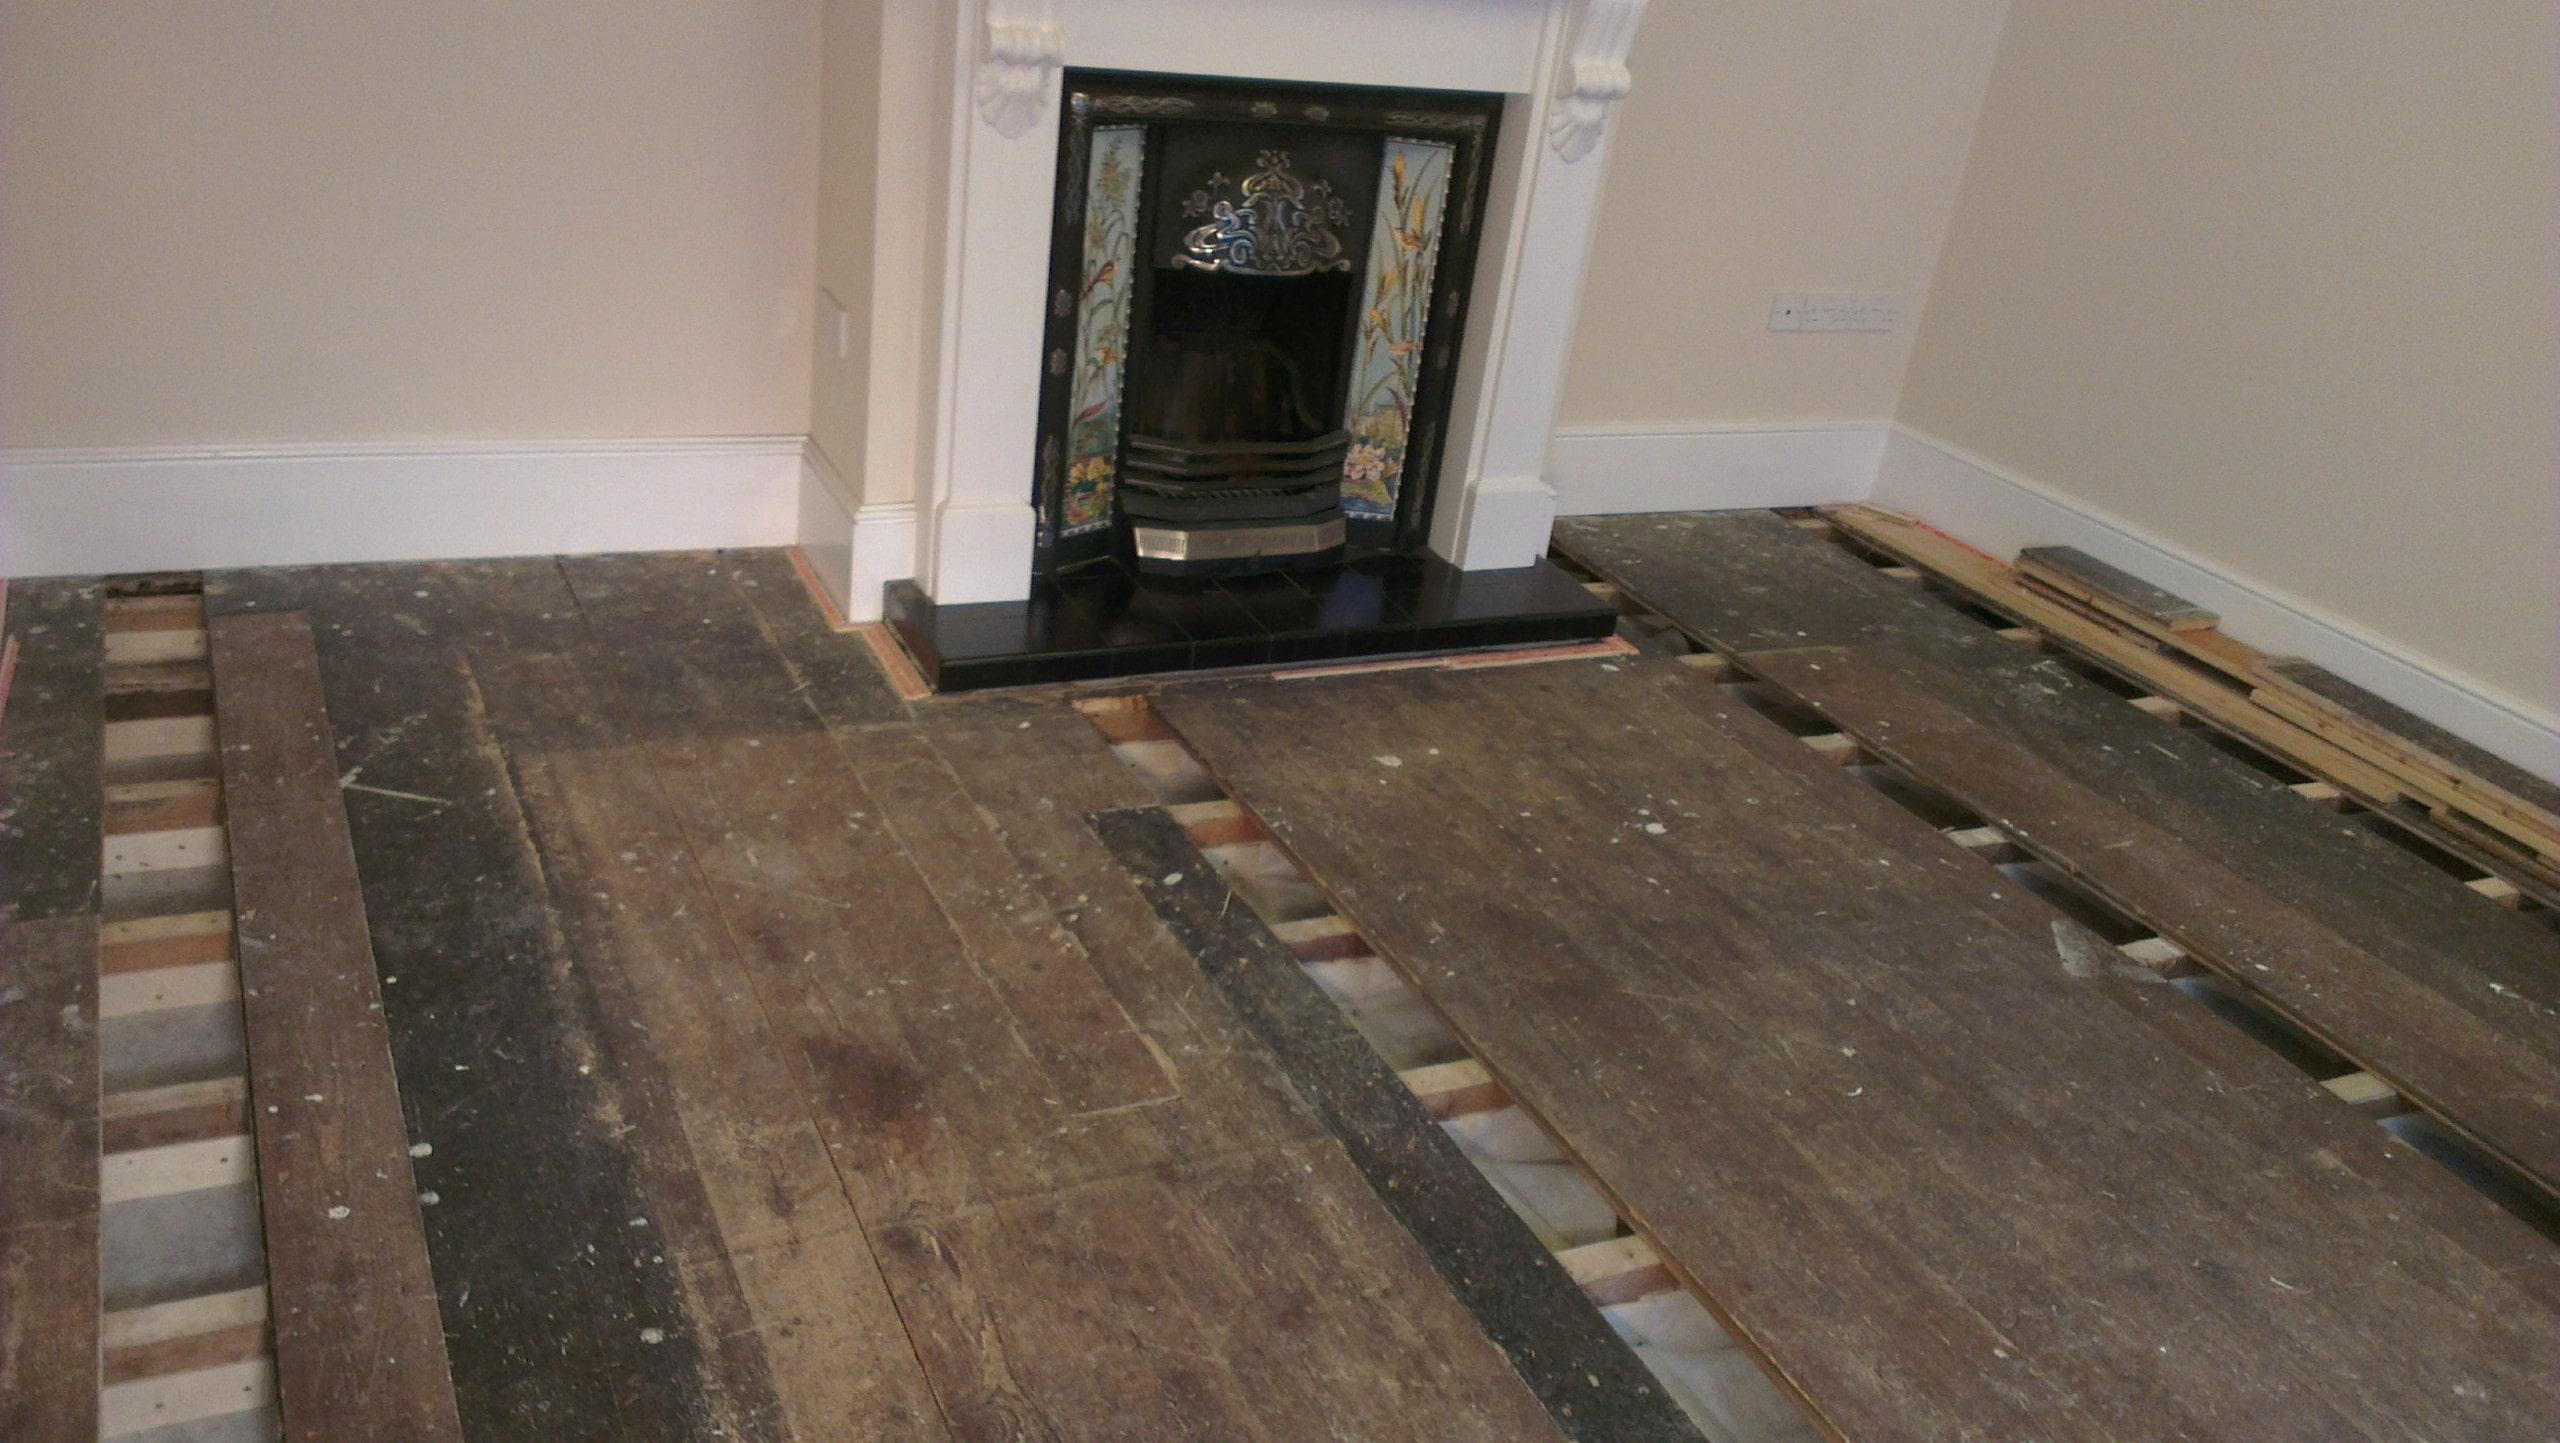 Underfloor Insulation Before install